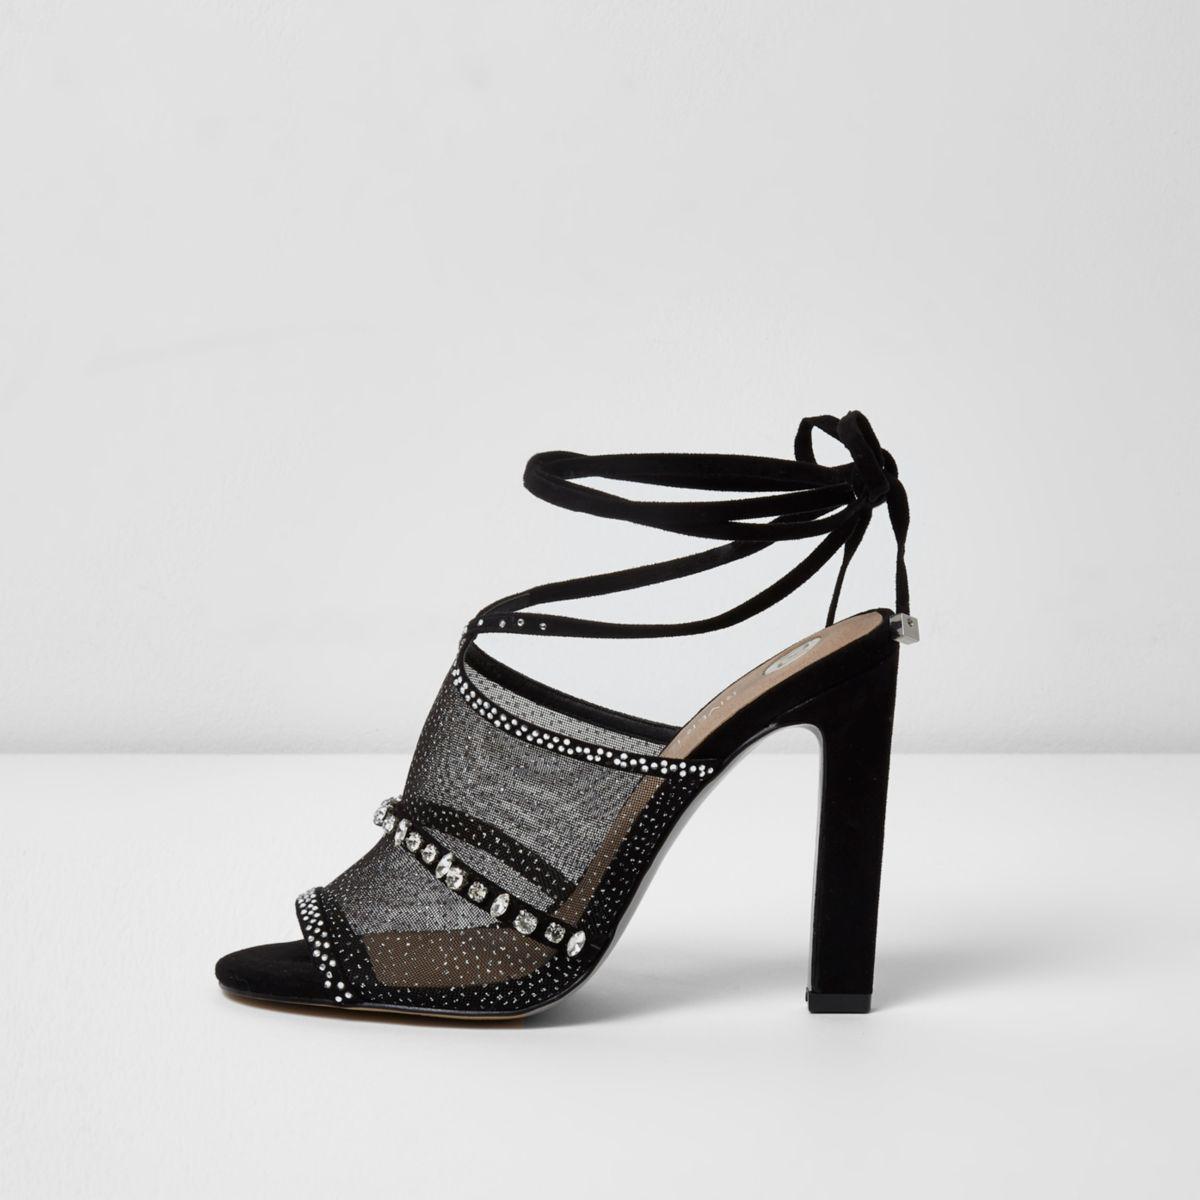 Black diamante embellished tie up sandals